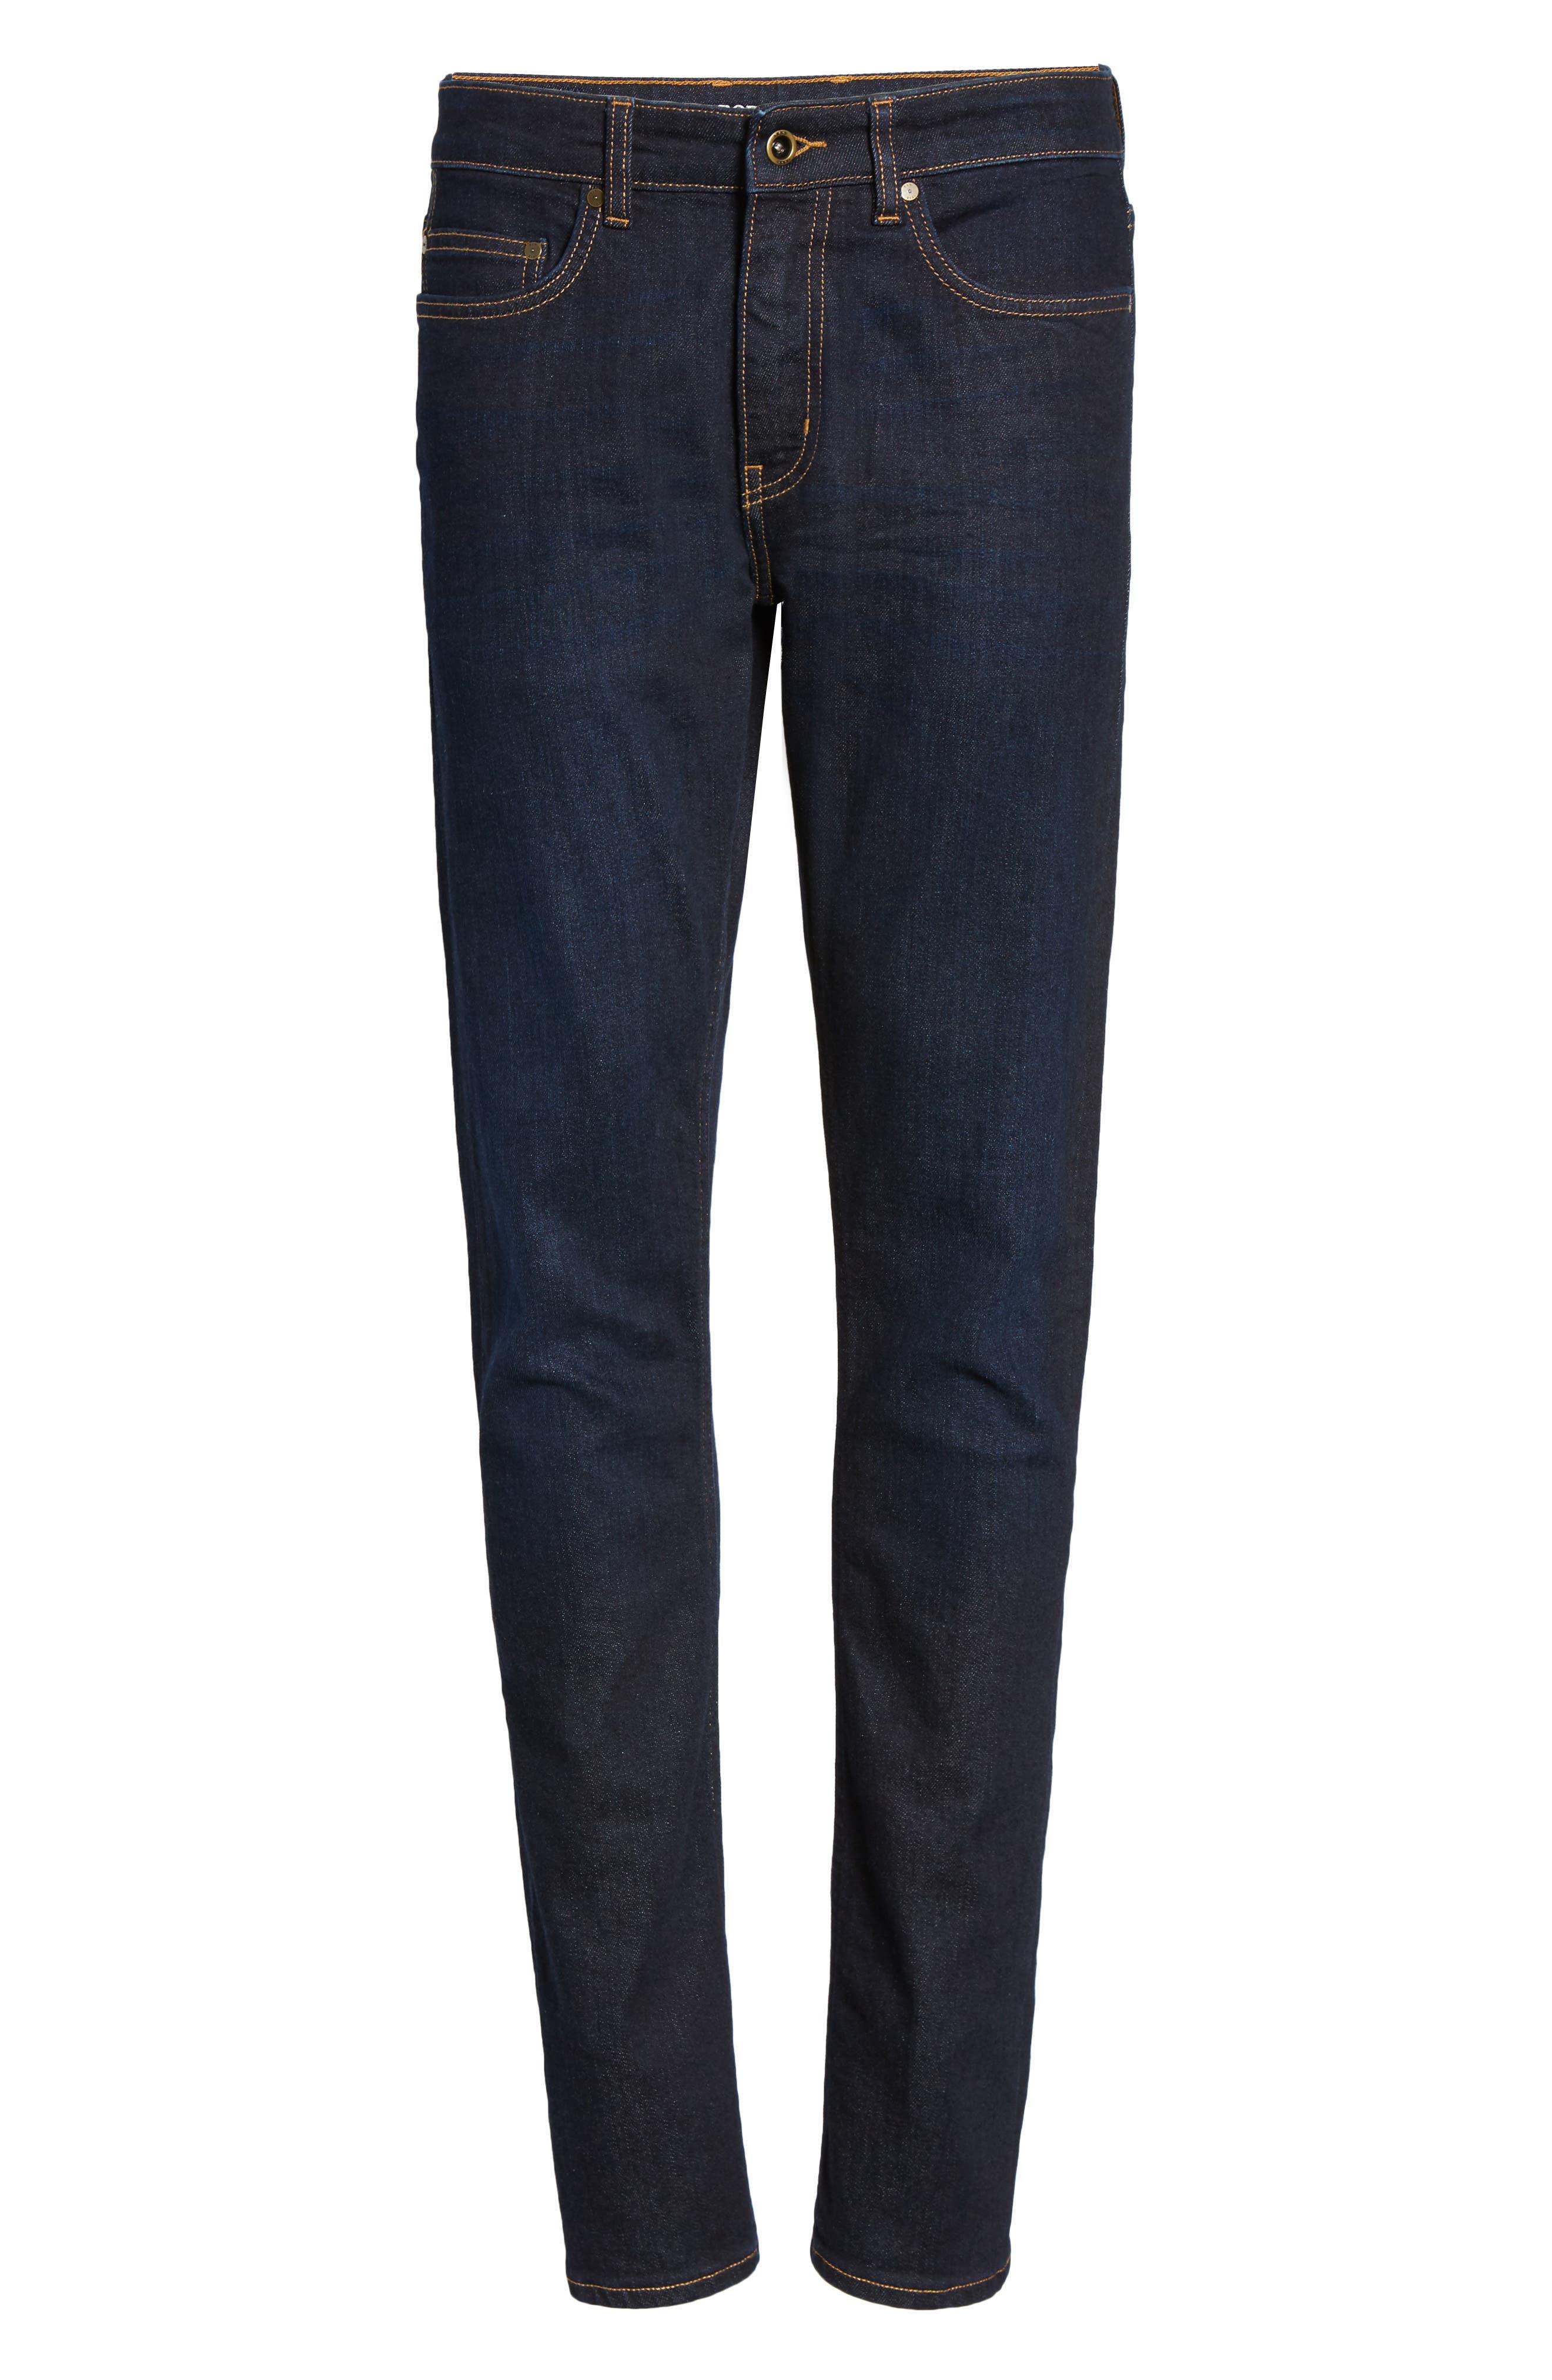 Fanshawe Straight Leg Jeans,                             Alternate thumbnail 6, color,                             Denim